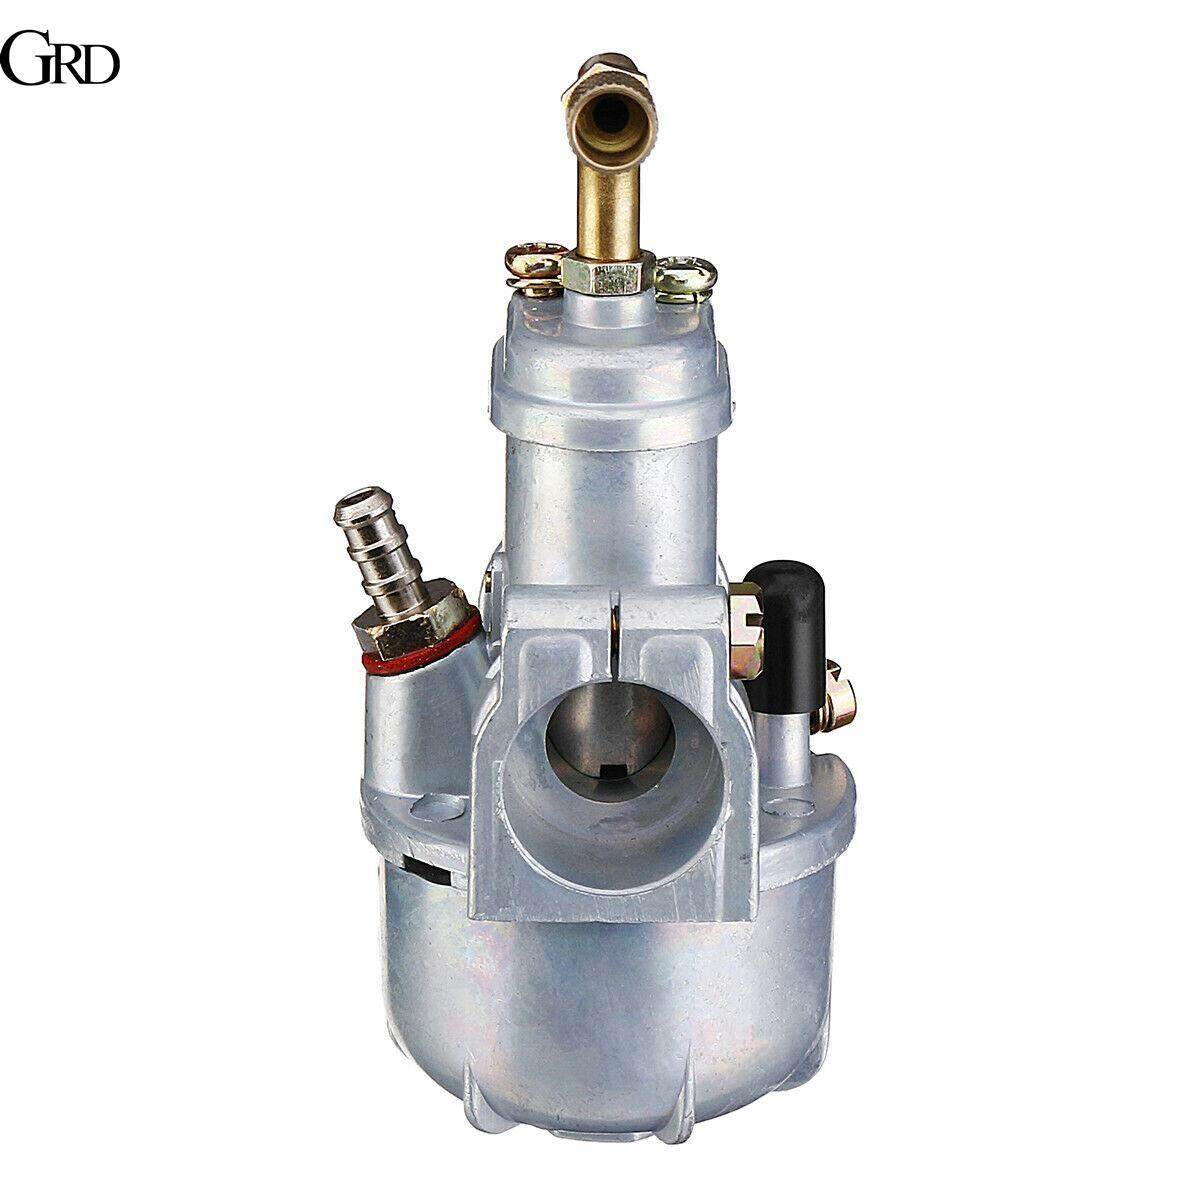 GRAND Store Stable Diameter Of Hole 12mm Grey Metal Carb Carburetor Carburetor Carb Carburetor Carb Metal Generator Air Intake Carburetor Engine Replacement Automotive